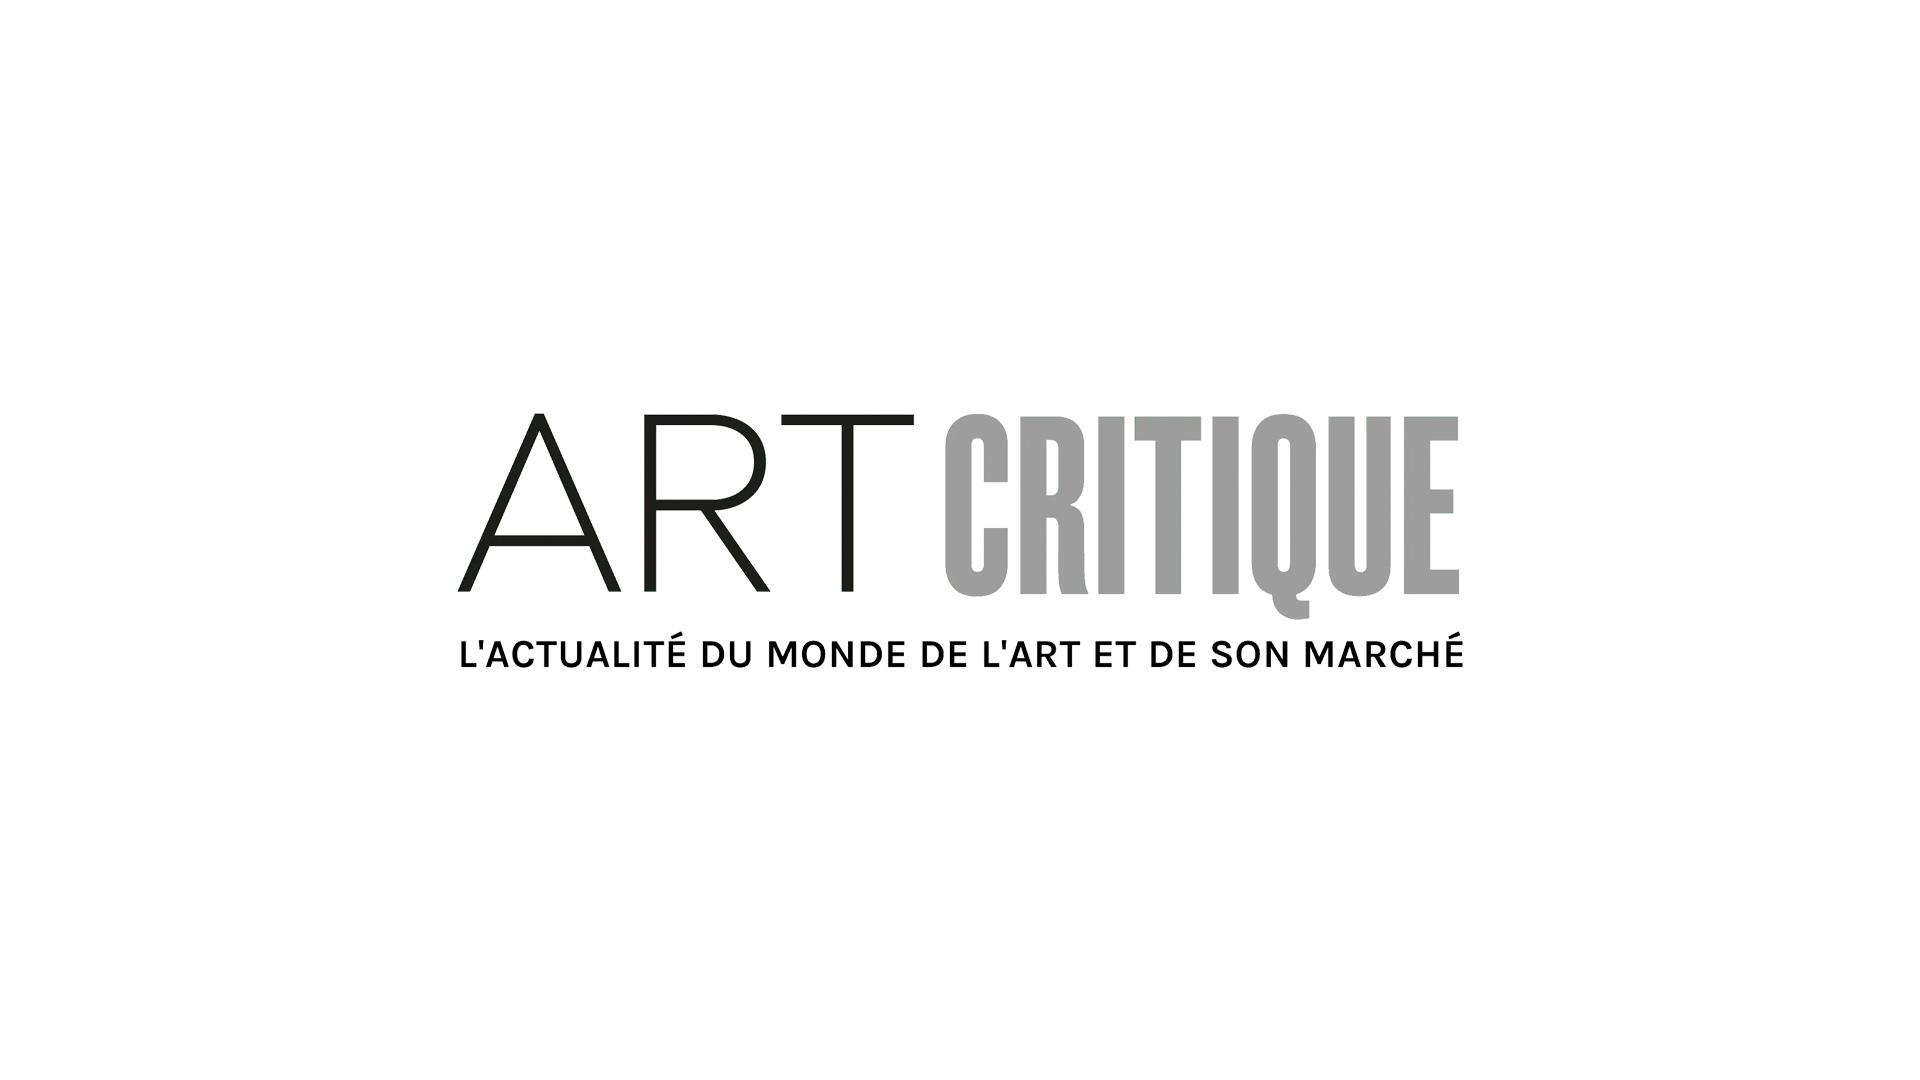 Un biopic sur le peintre Antonio Ligabue